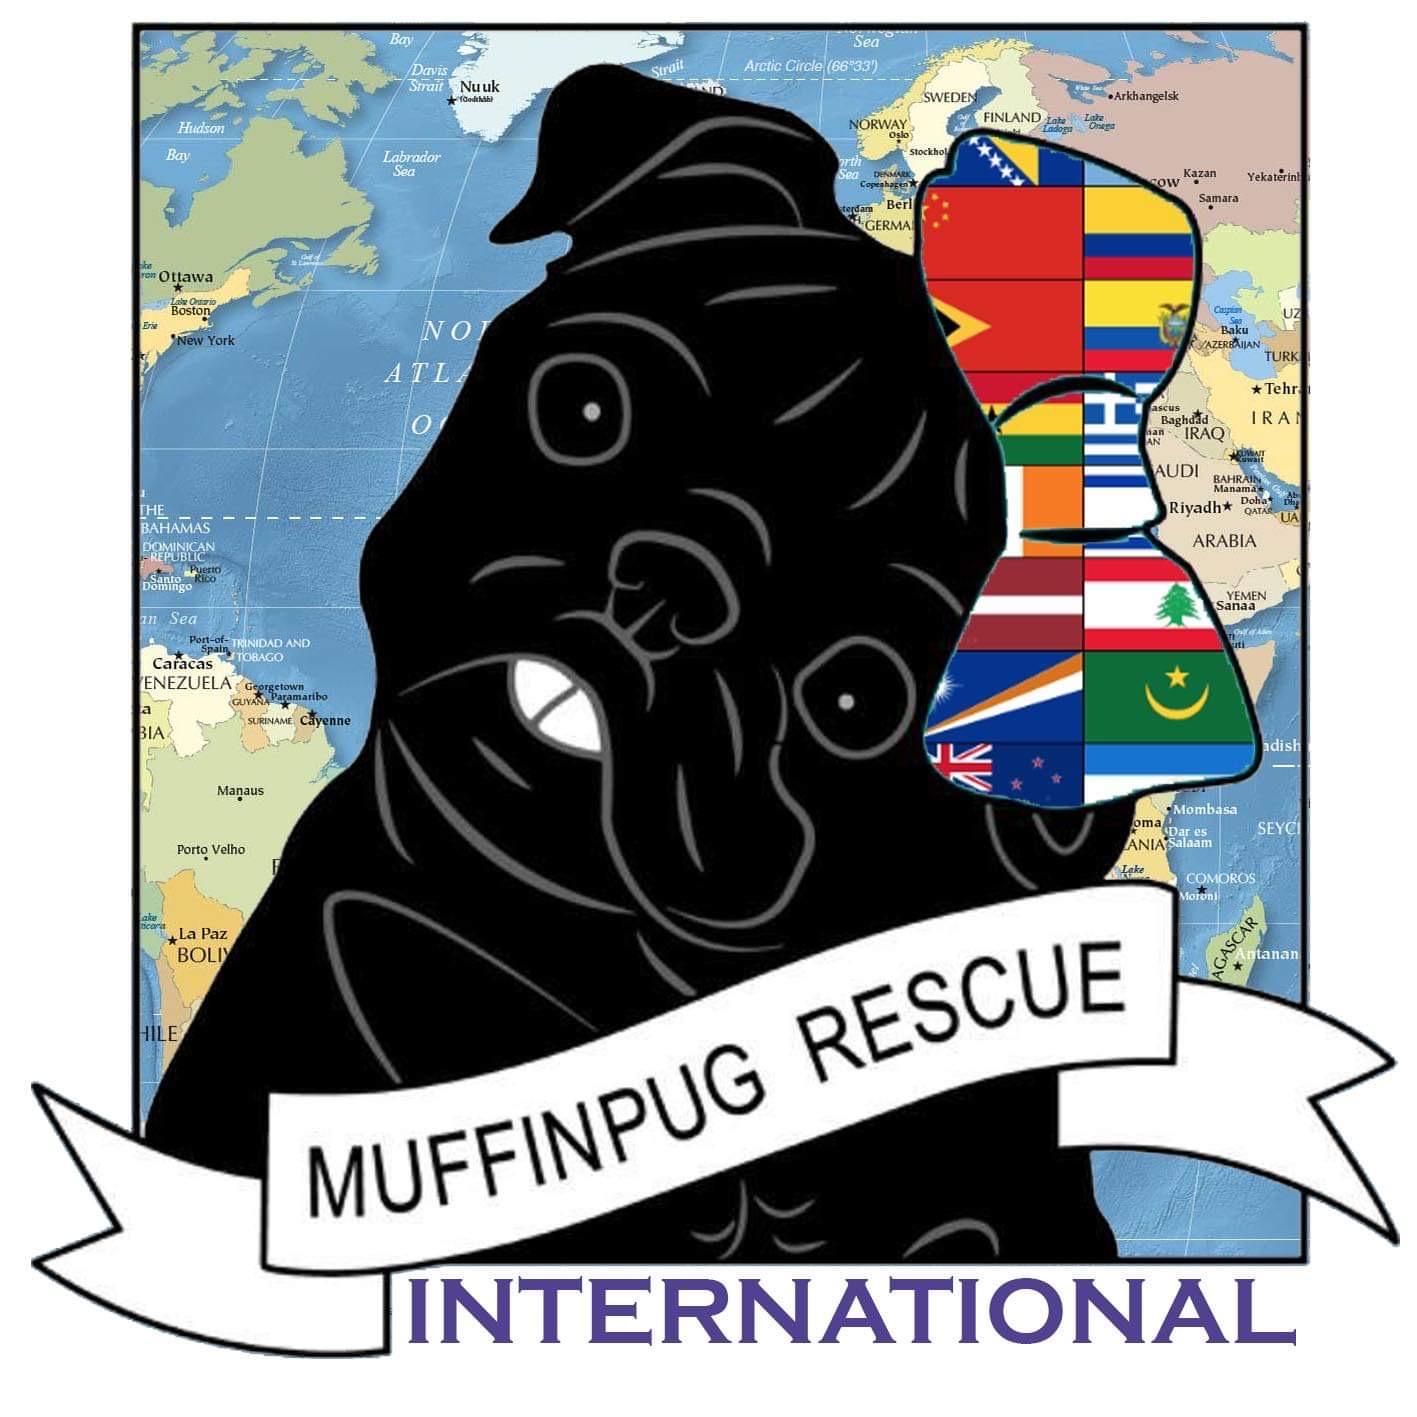 MuffinPug International Logo